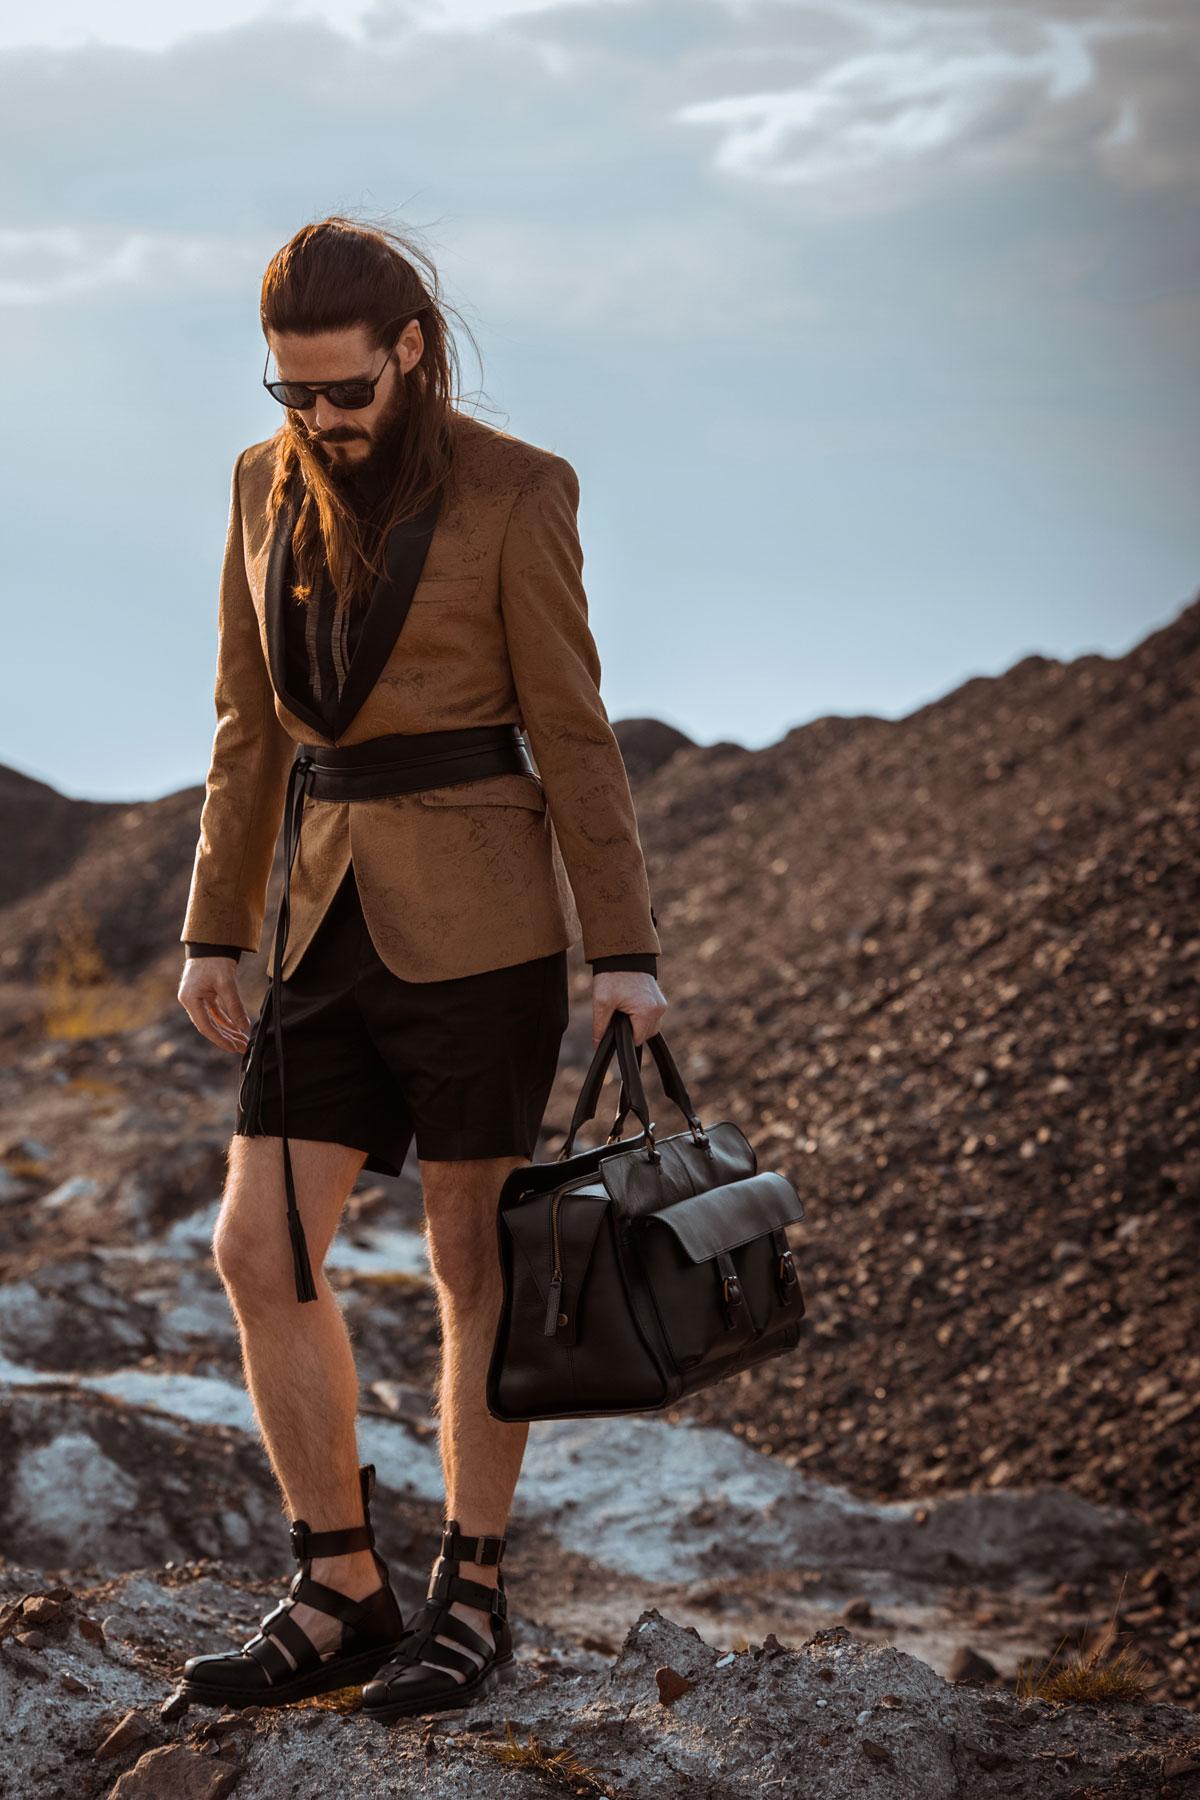 Maennermode-Blog-elegantes-Outfit-Taillenguertel-Sakko-Shorts-Boots-Malefashion